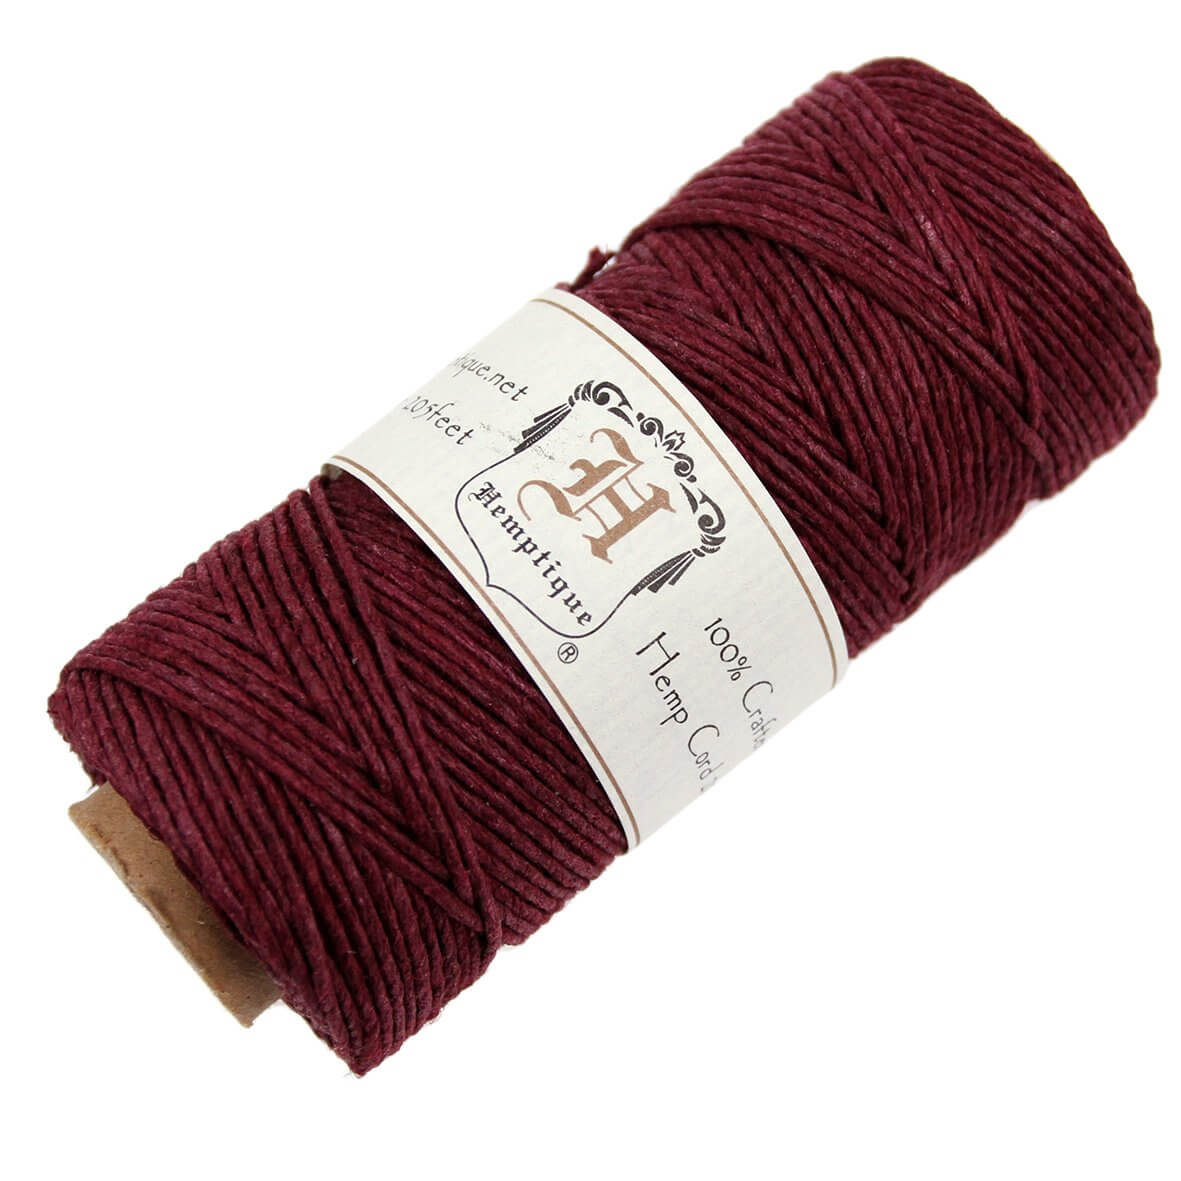 Hemptique Hemp Cord - Burgundy